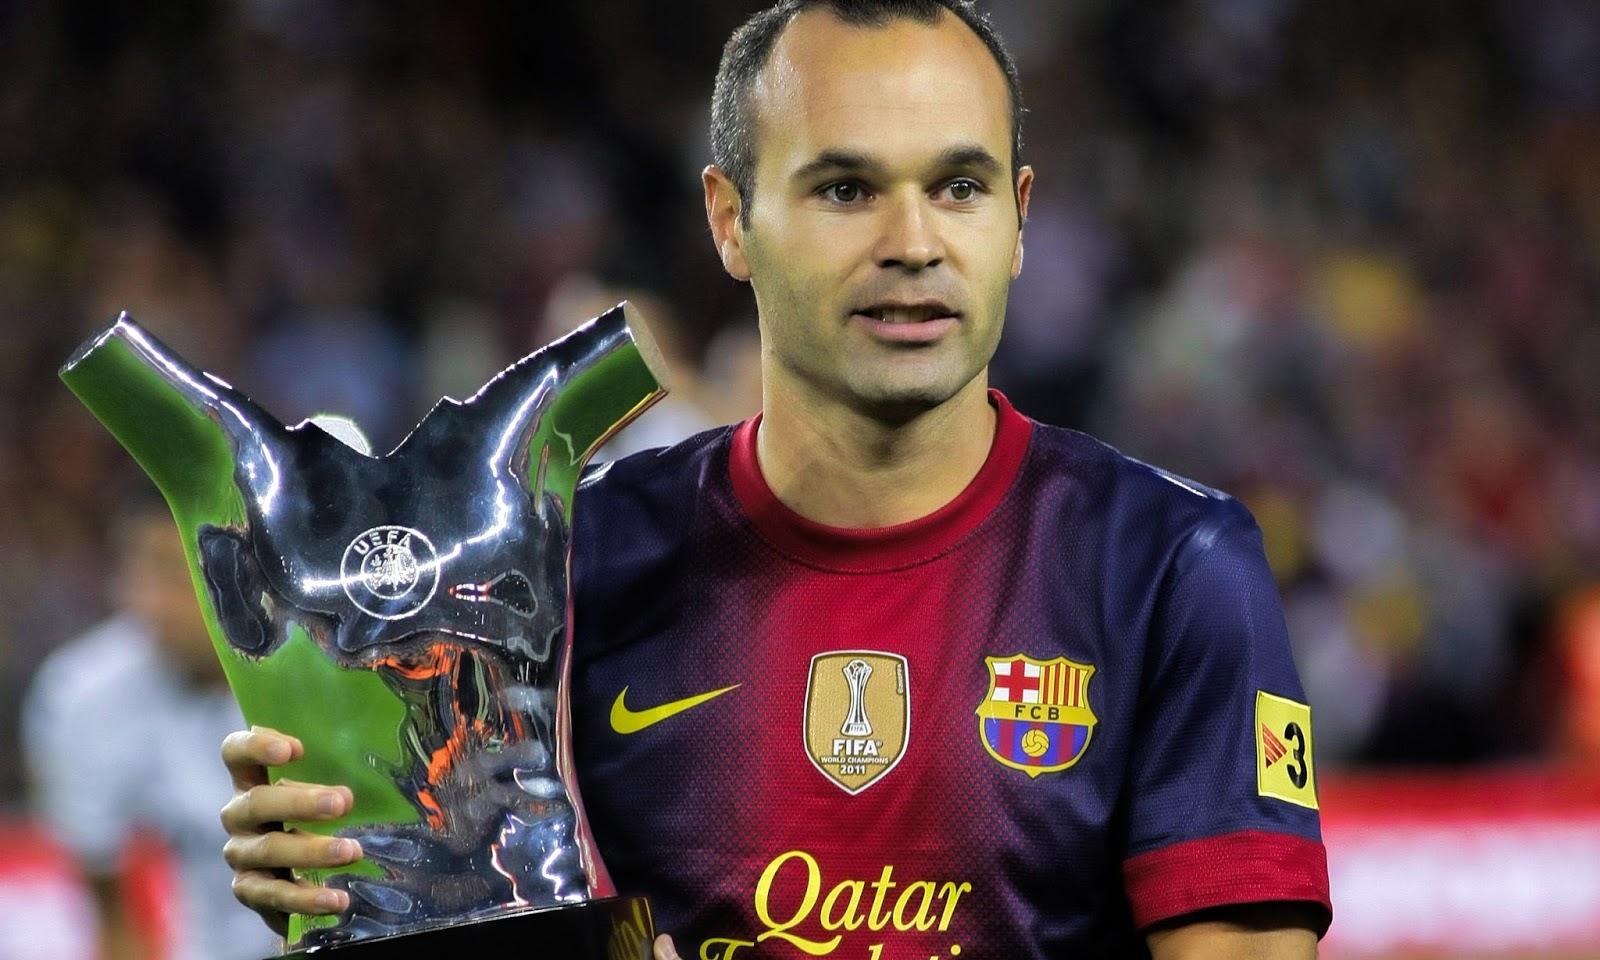 Andres iniesta new fc barcelona club captain 2015 hd for Club de fumadores barcelona